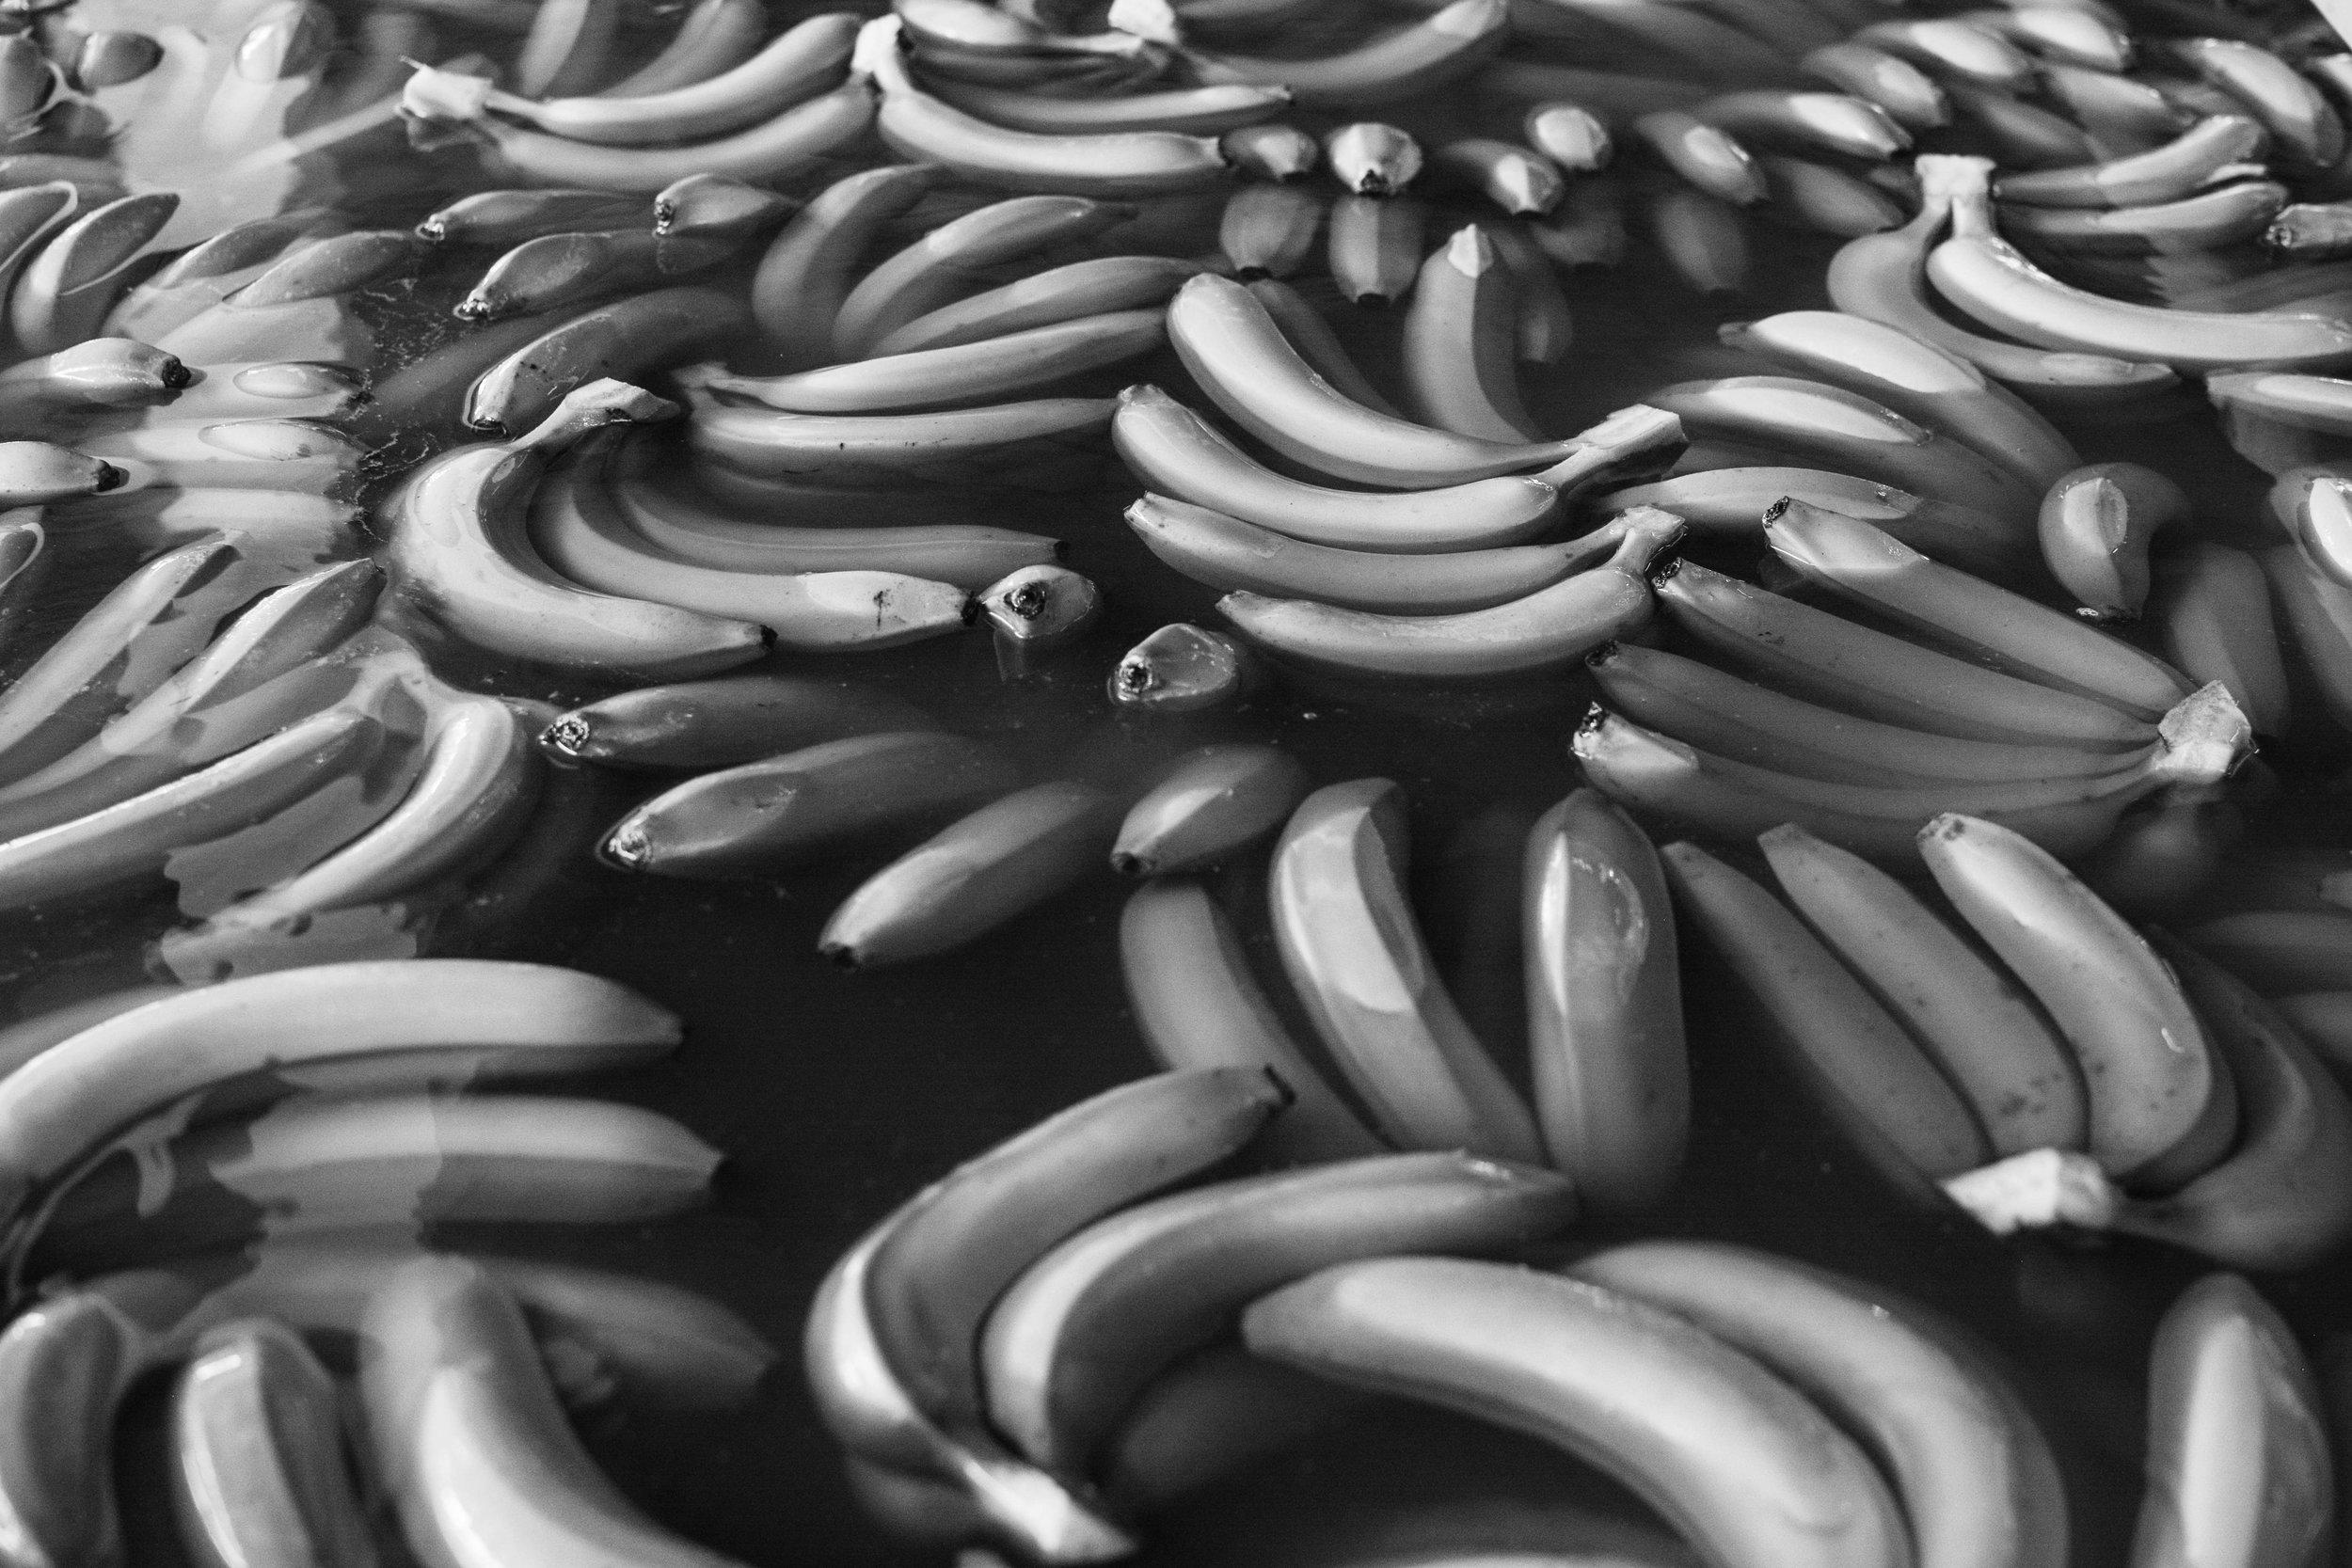 30-banana-DSC_9910.jpg